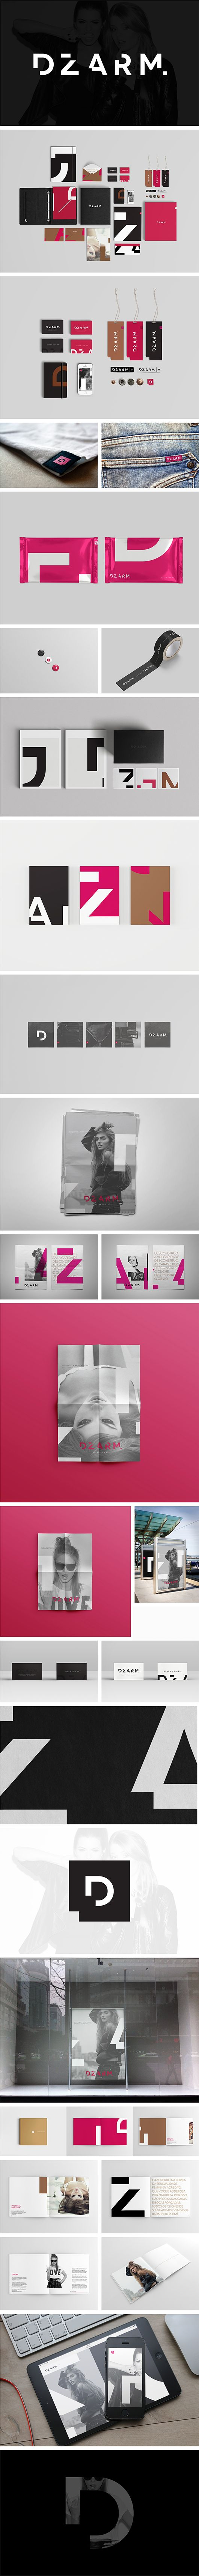 DZARM. – REBRANDING: Corporate Identity design system, Branding | Design by Diego Bellorin with Estúdio Colírio.